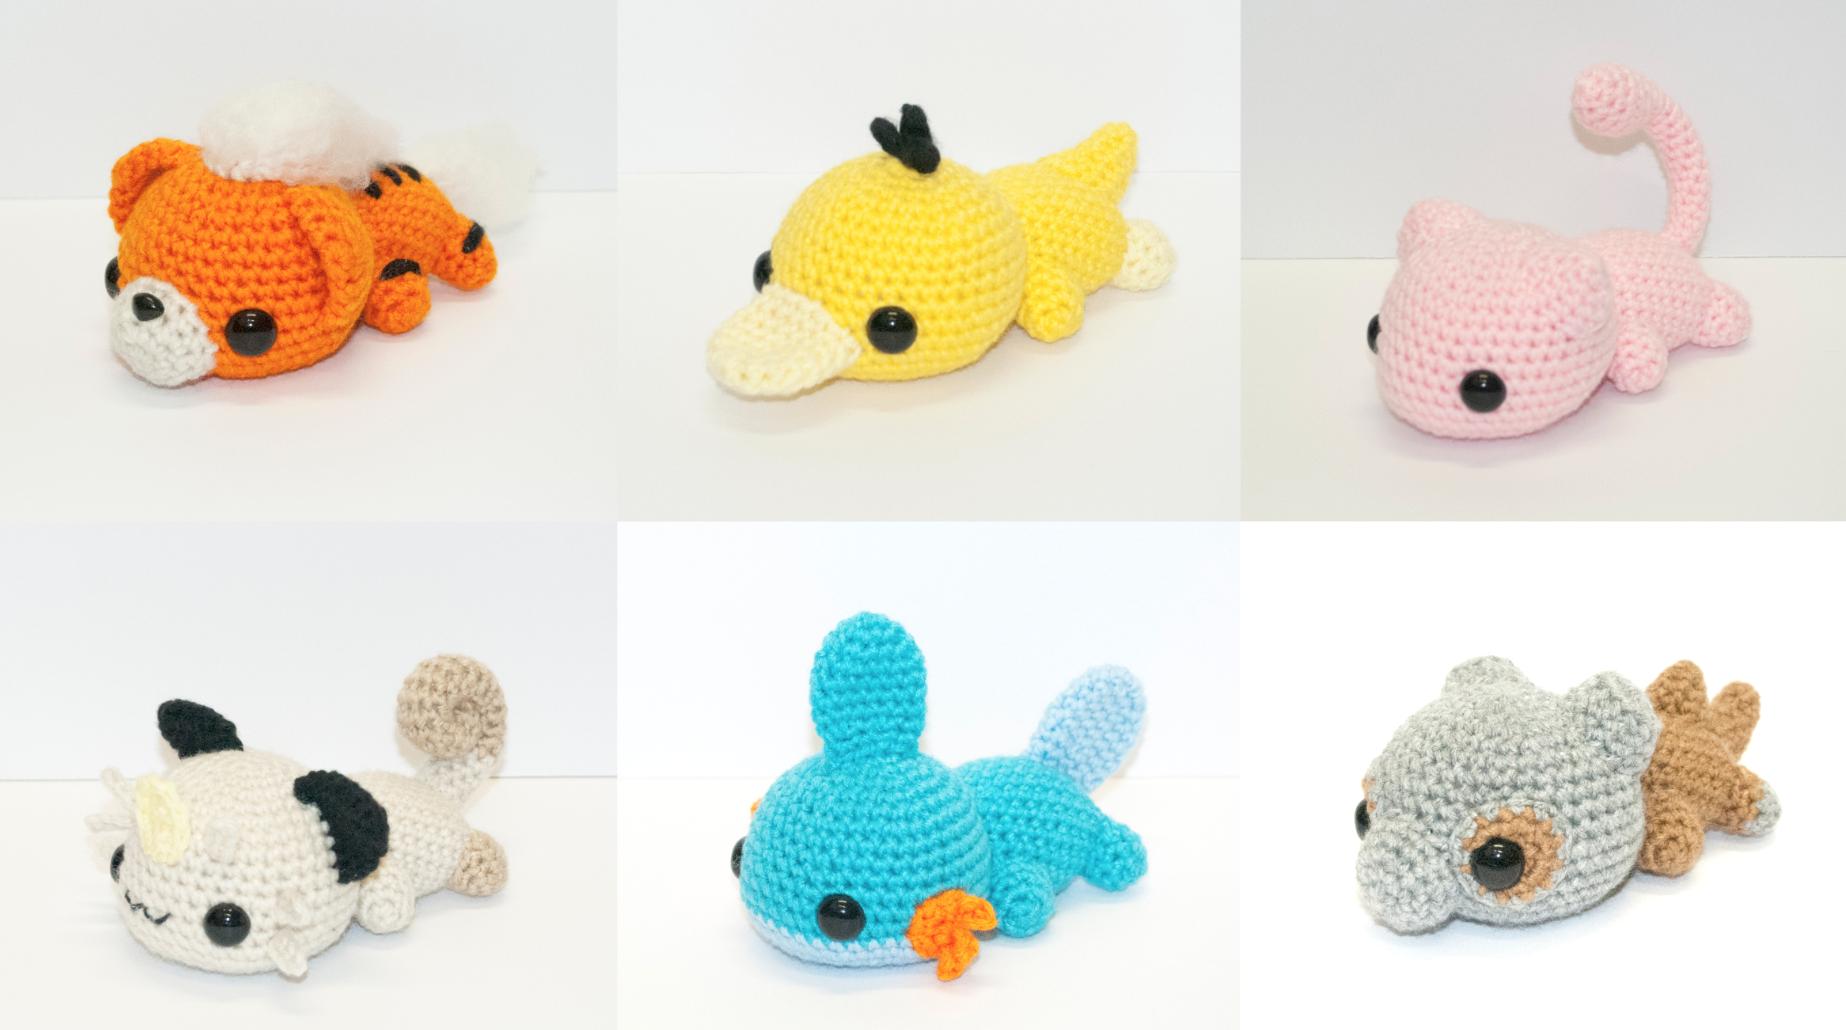 Pokemon-Peluches-Crochet-1 | amigurumi | Pinterest | Croché ...